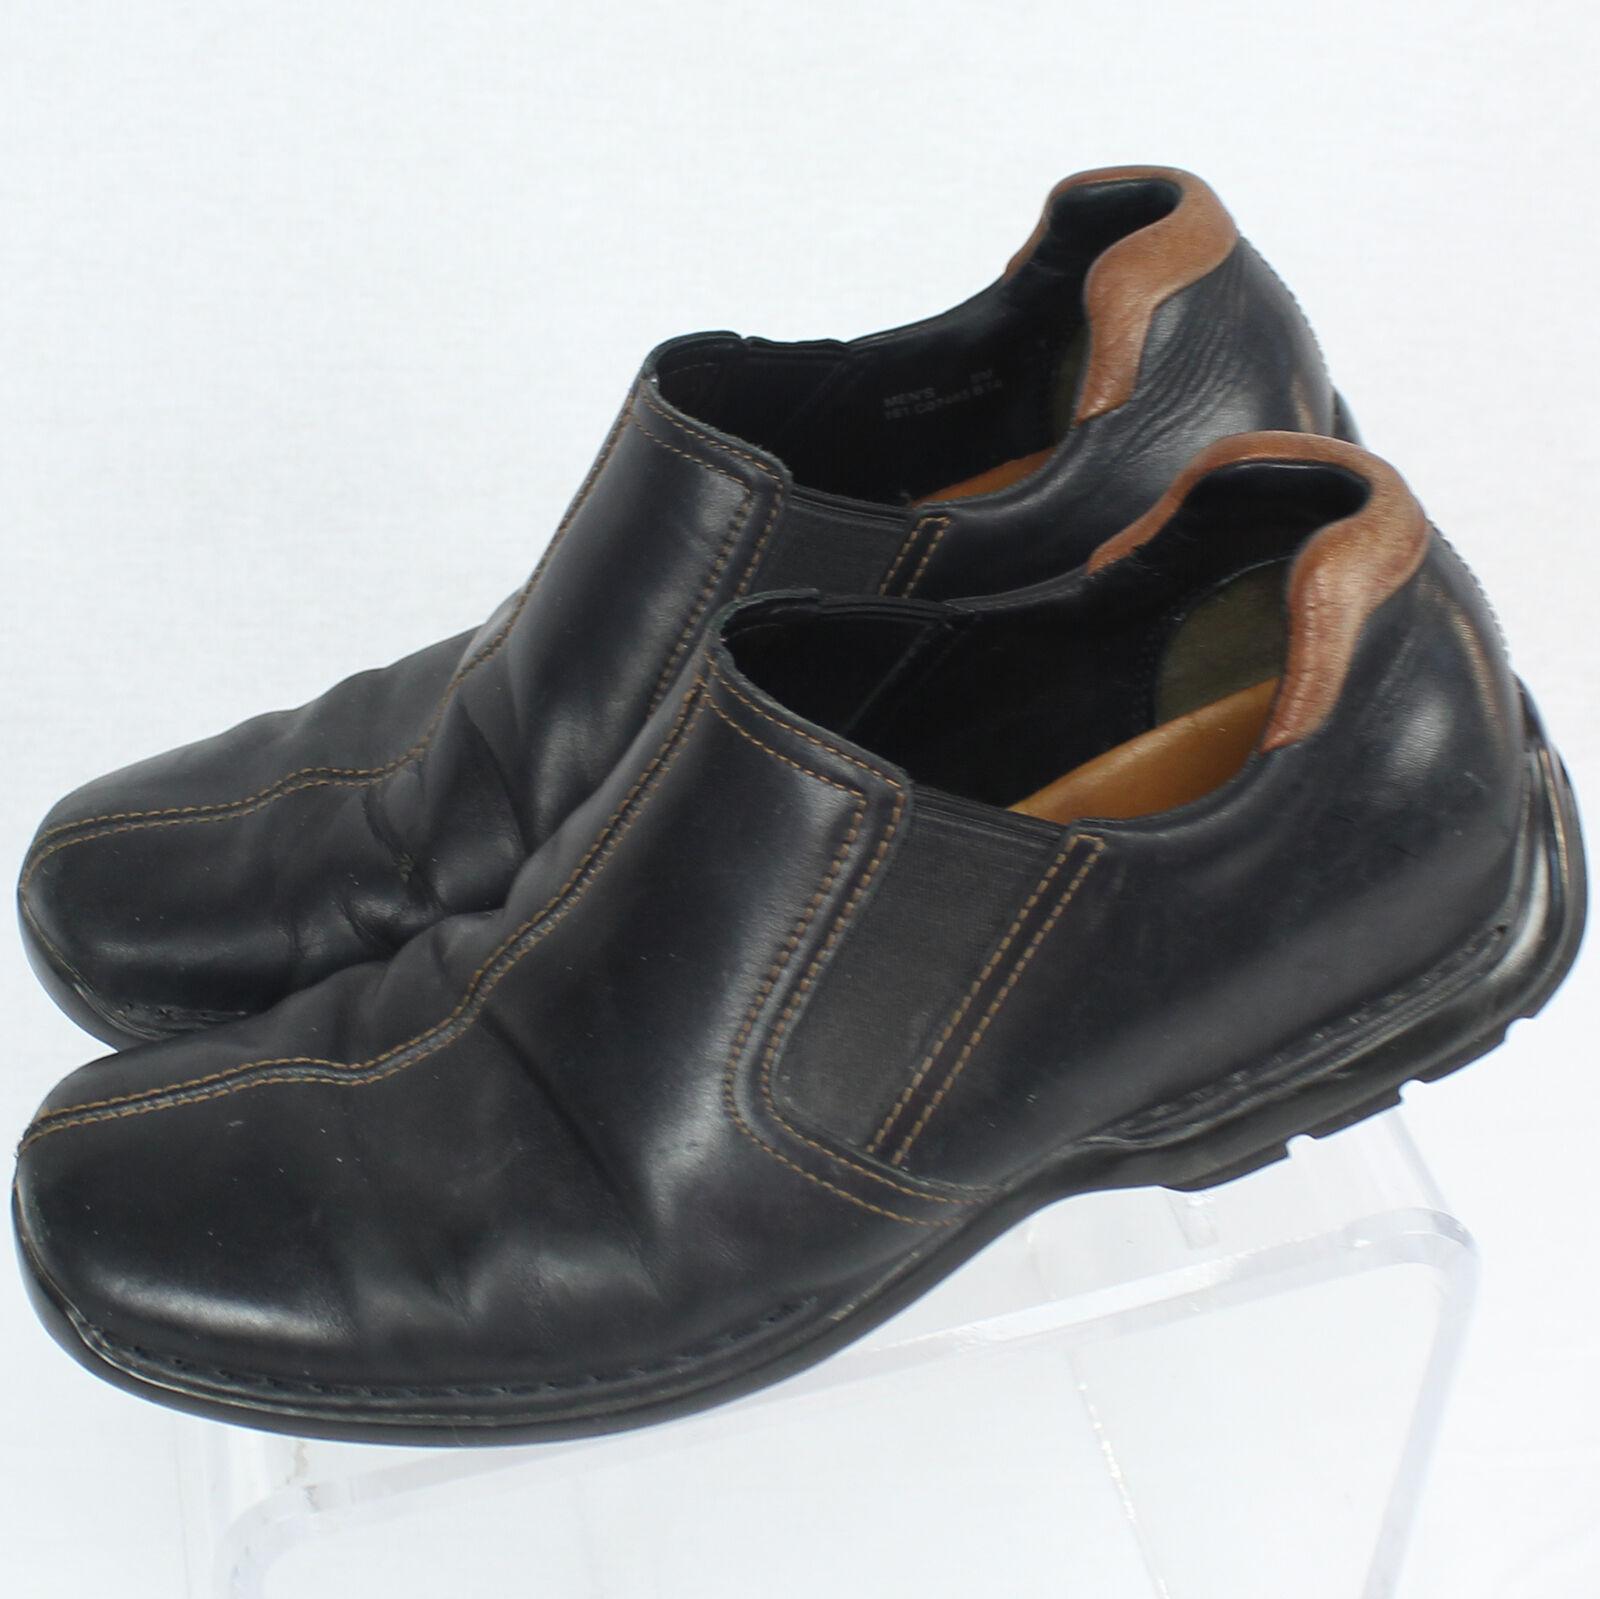 Cole Haan Men Solid Black Leather Slip On shoes Sz 9 Medium Width EUC